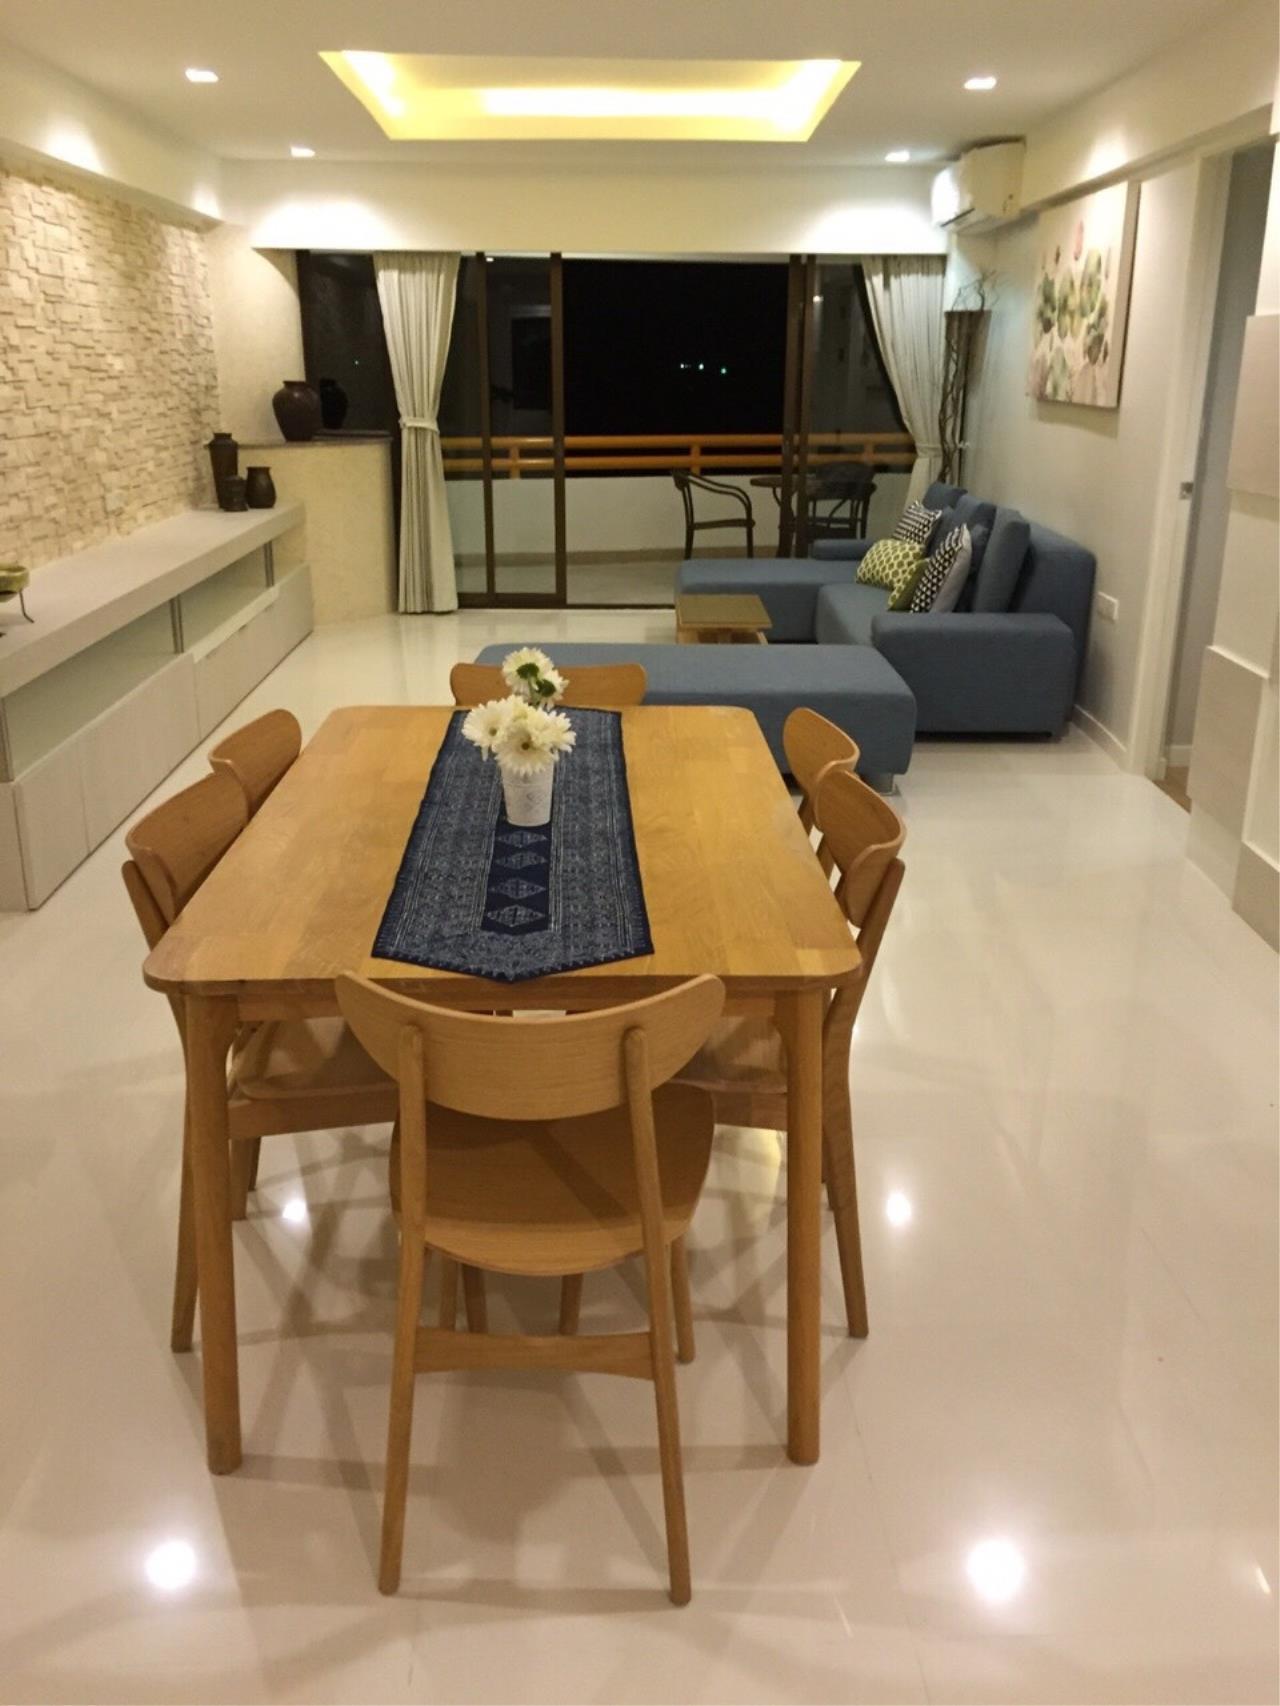 Blueocean property Agency's Condo For Rent – Sunshine Beach Condotel Pattaya 10